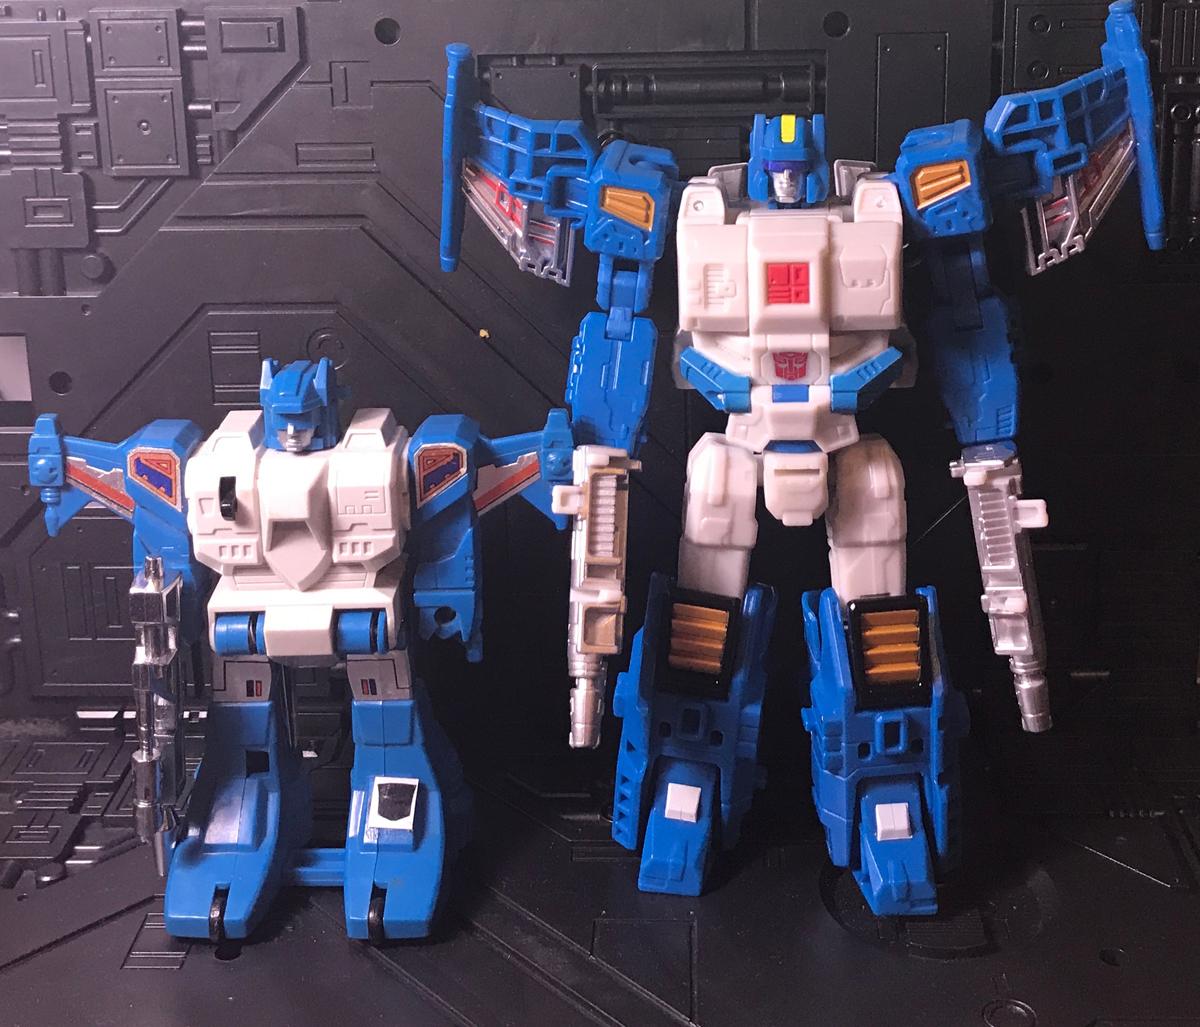 Topspin robot modes